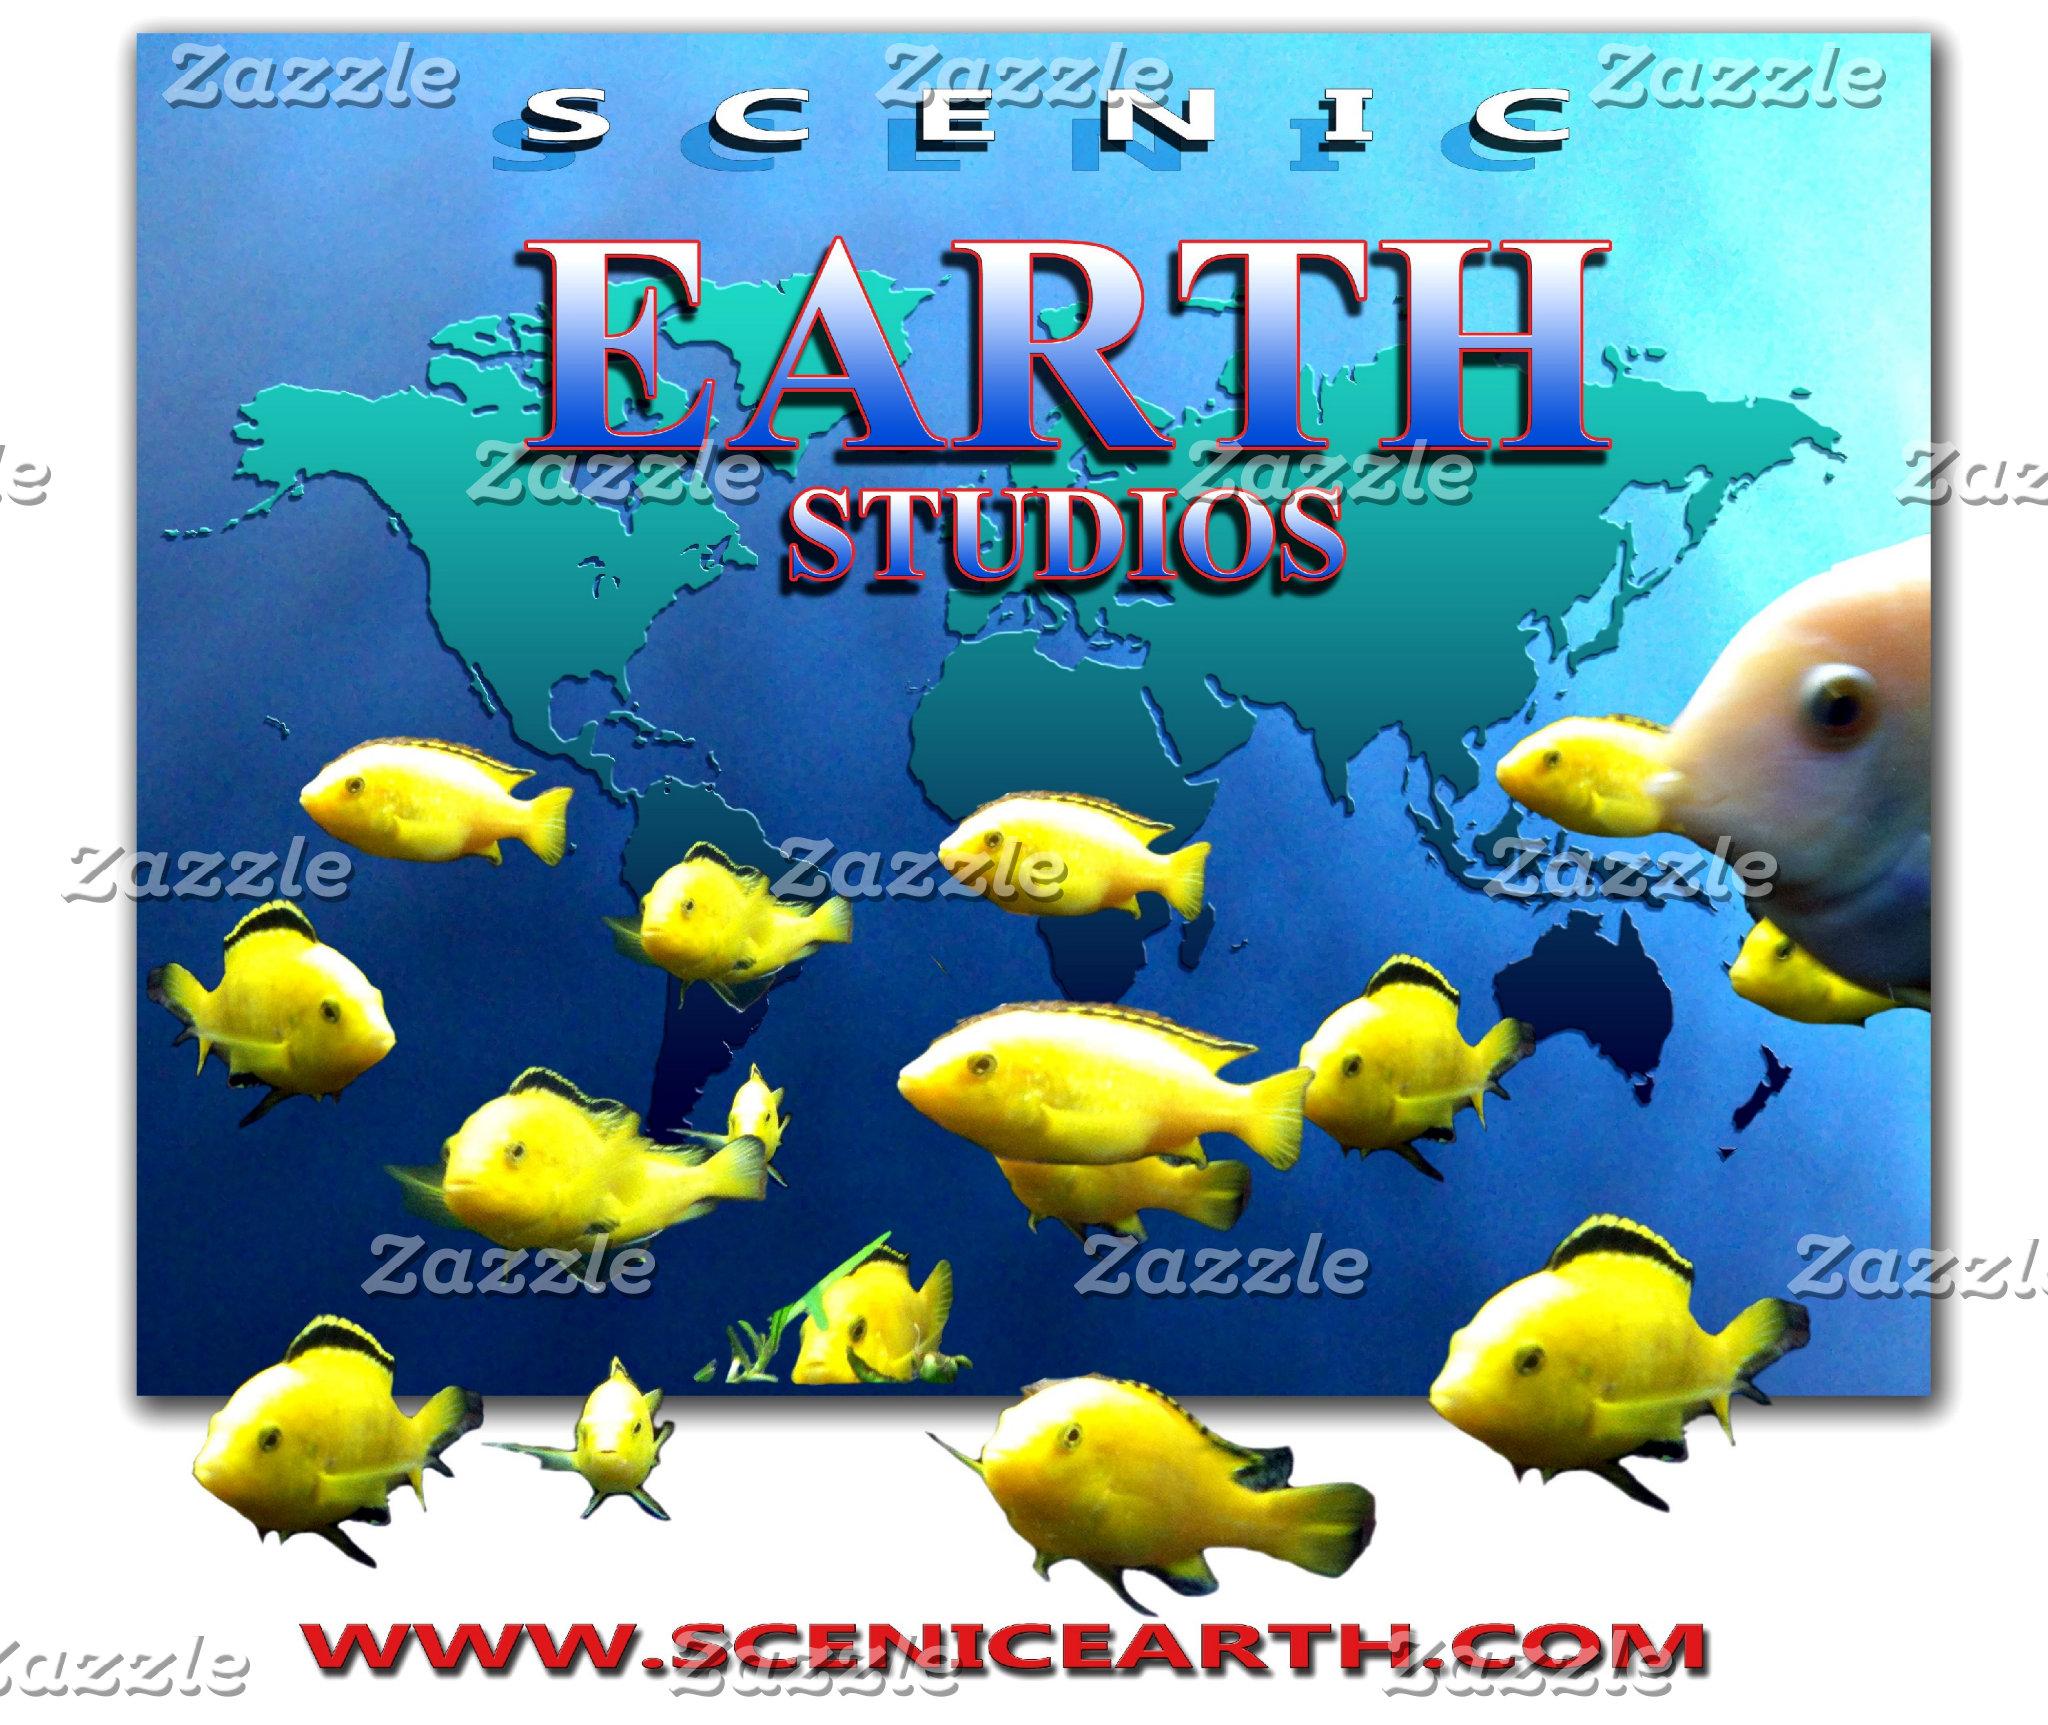 Scenic Earth Studios